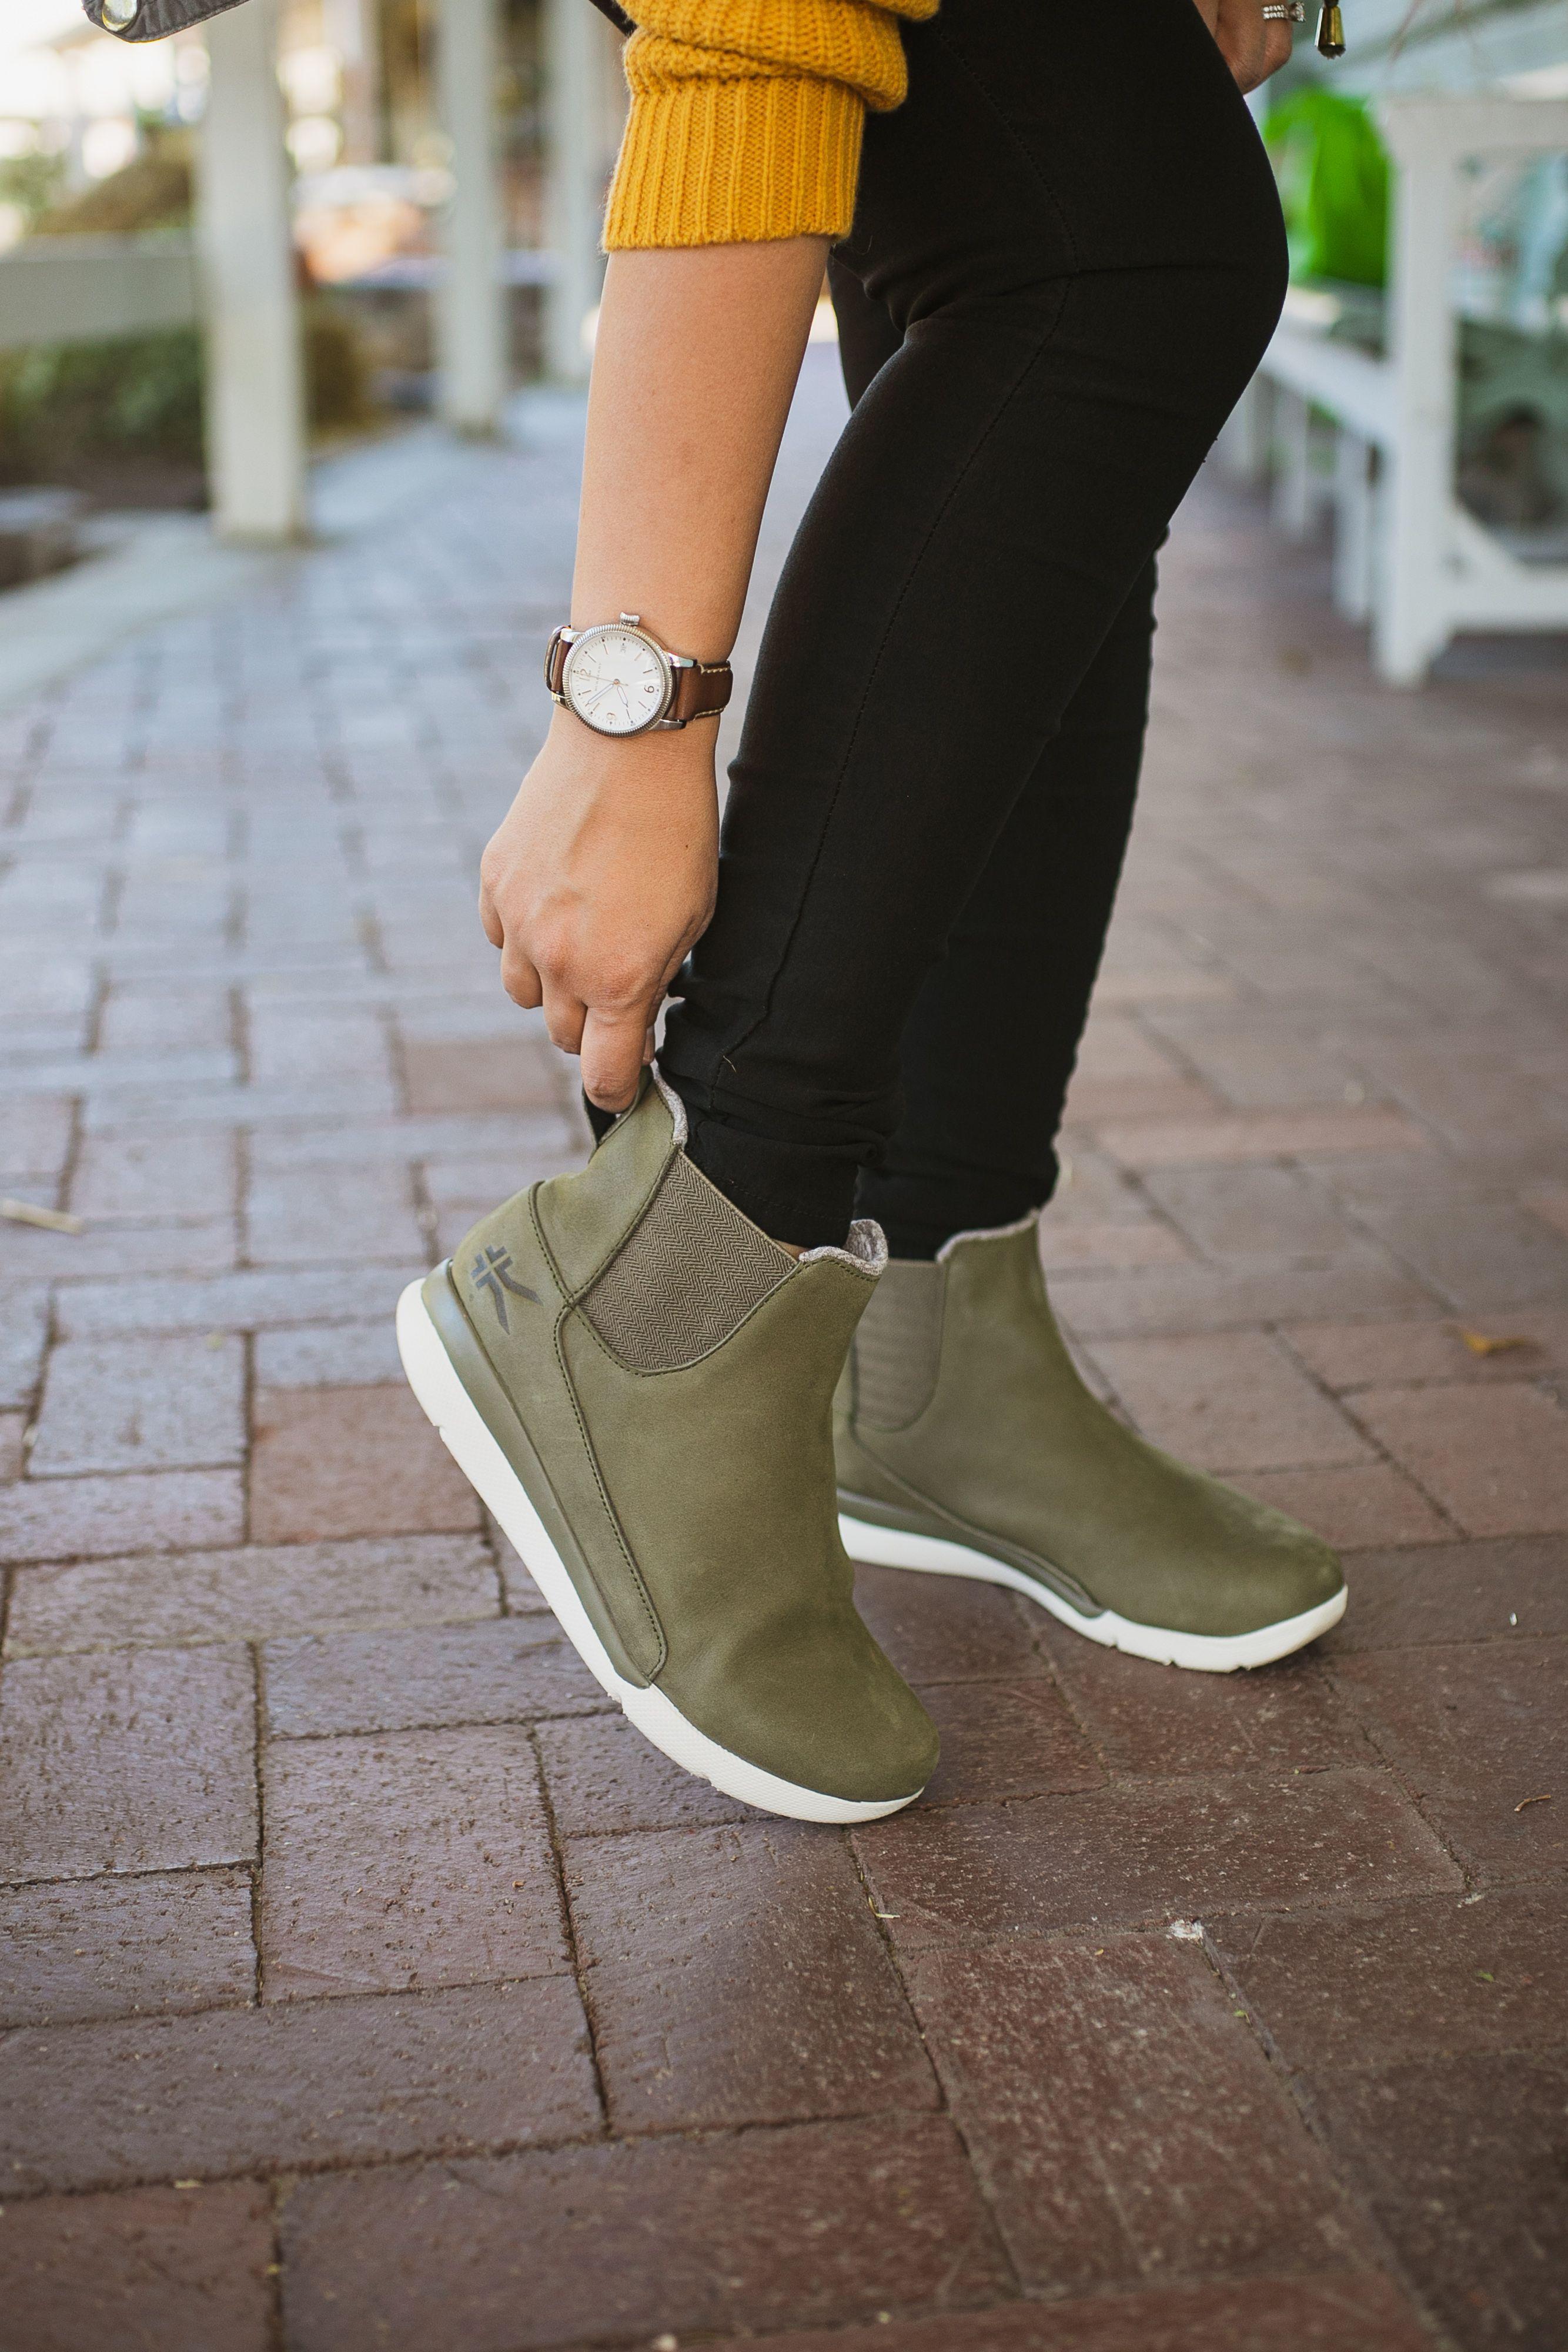 Fall / Winter Shoes KURU Footwear